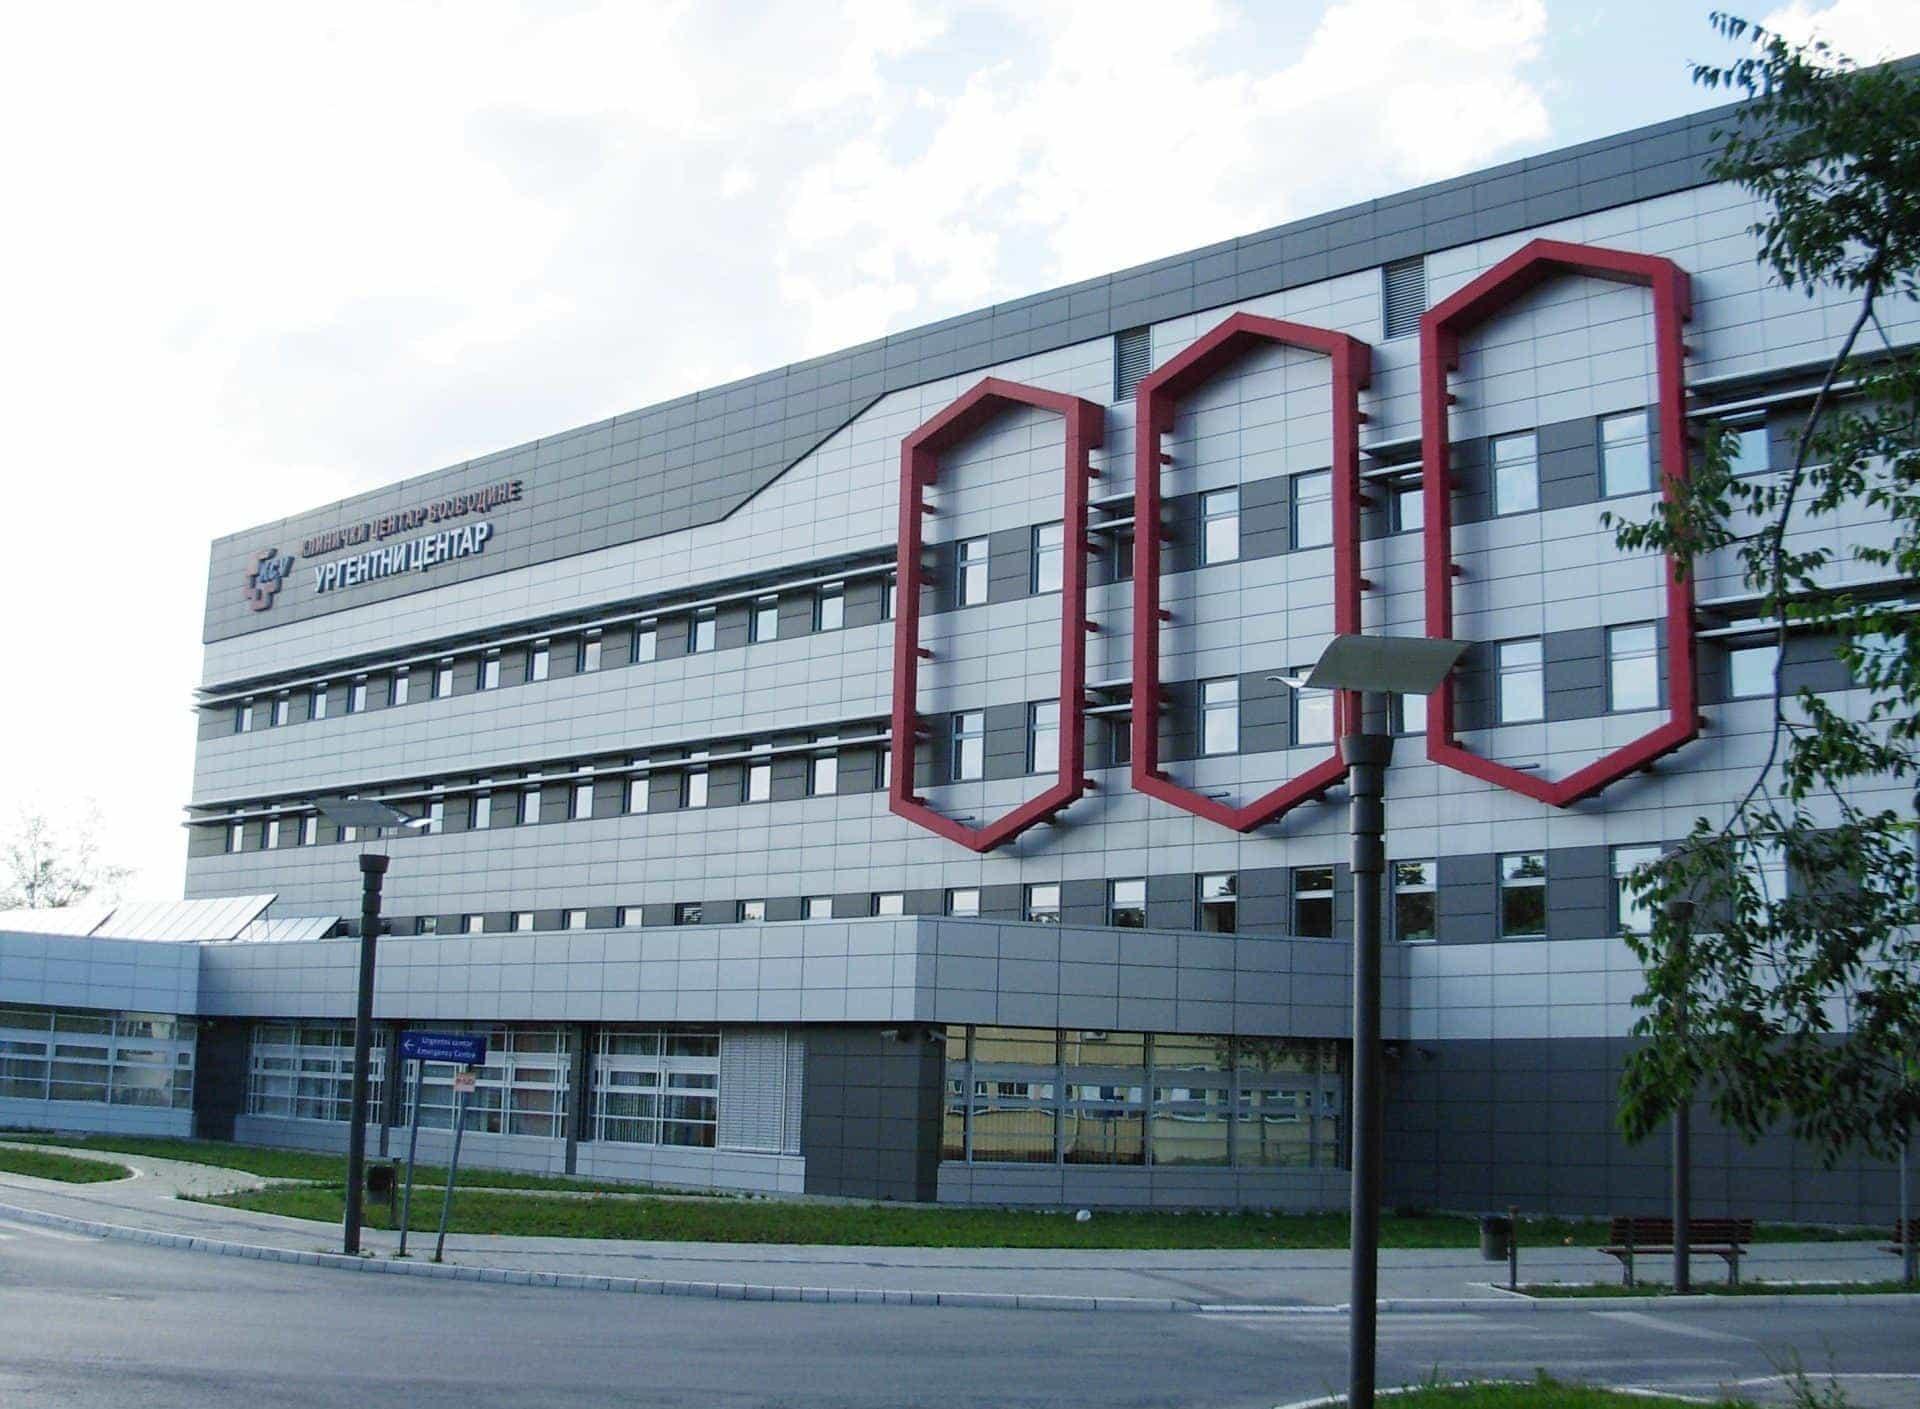 Edificio inteligente Serbia Ted4bee